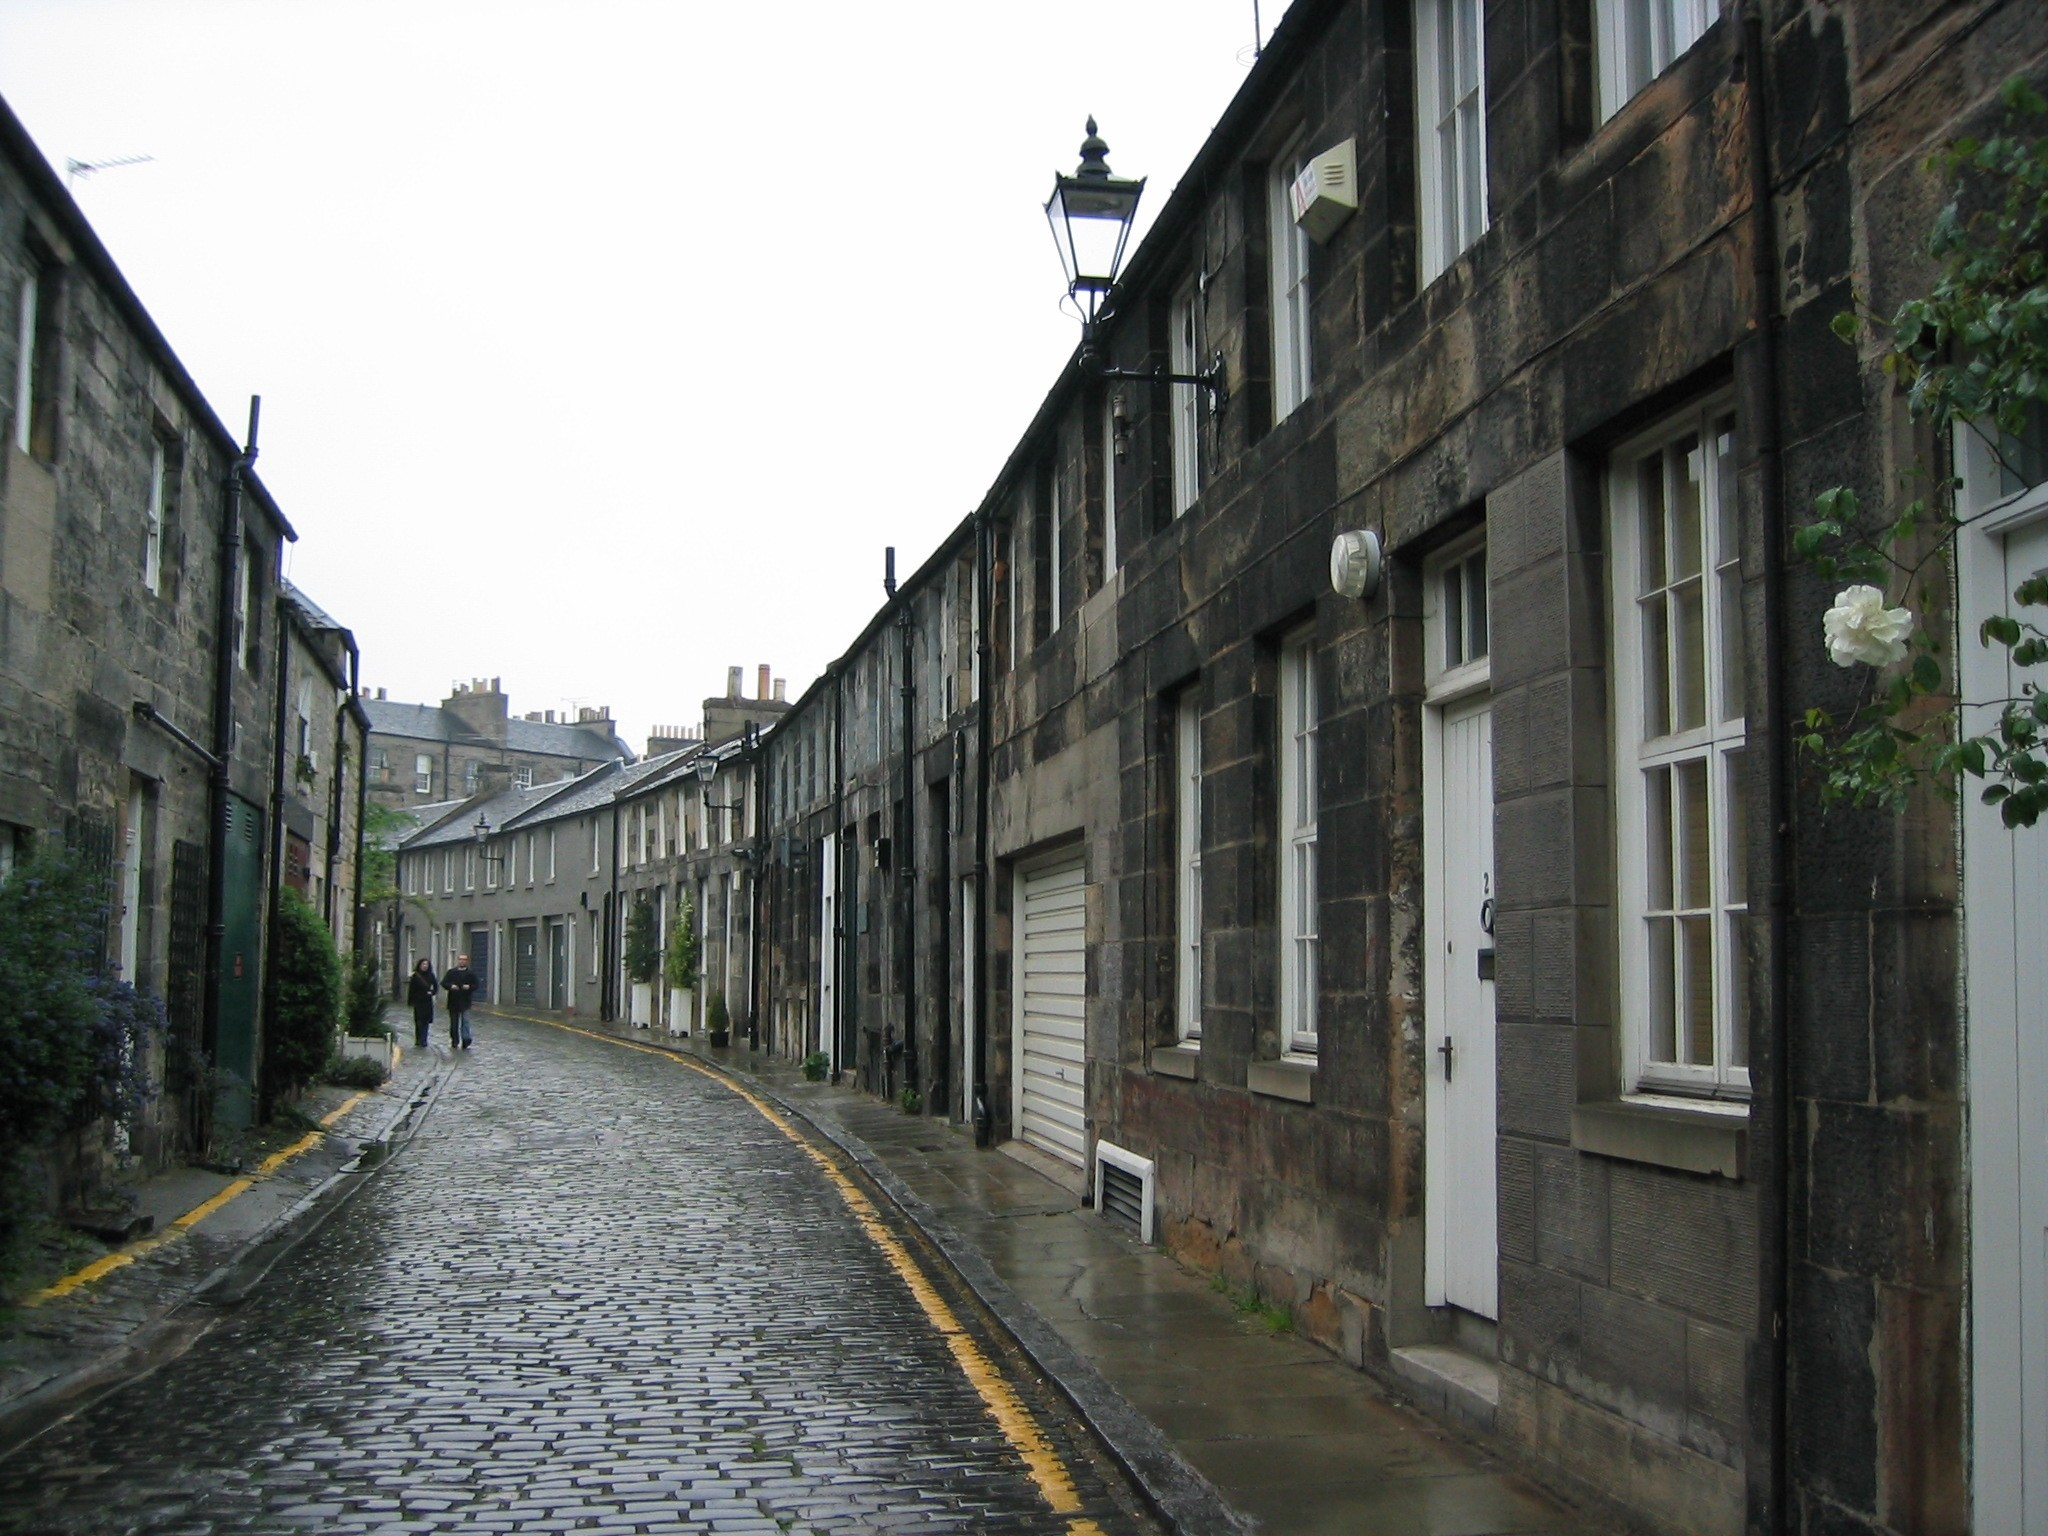 Edinburgh Streets - in Stockbridge